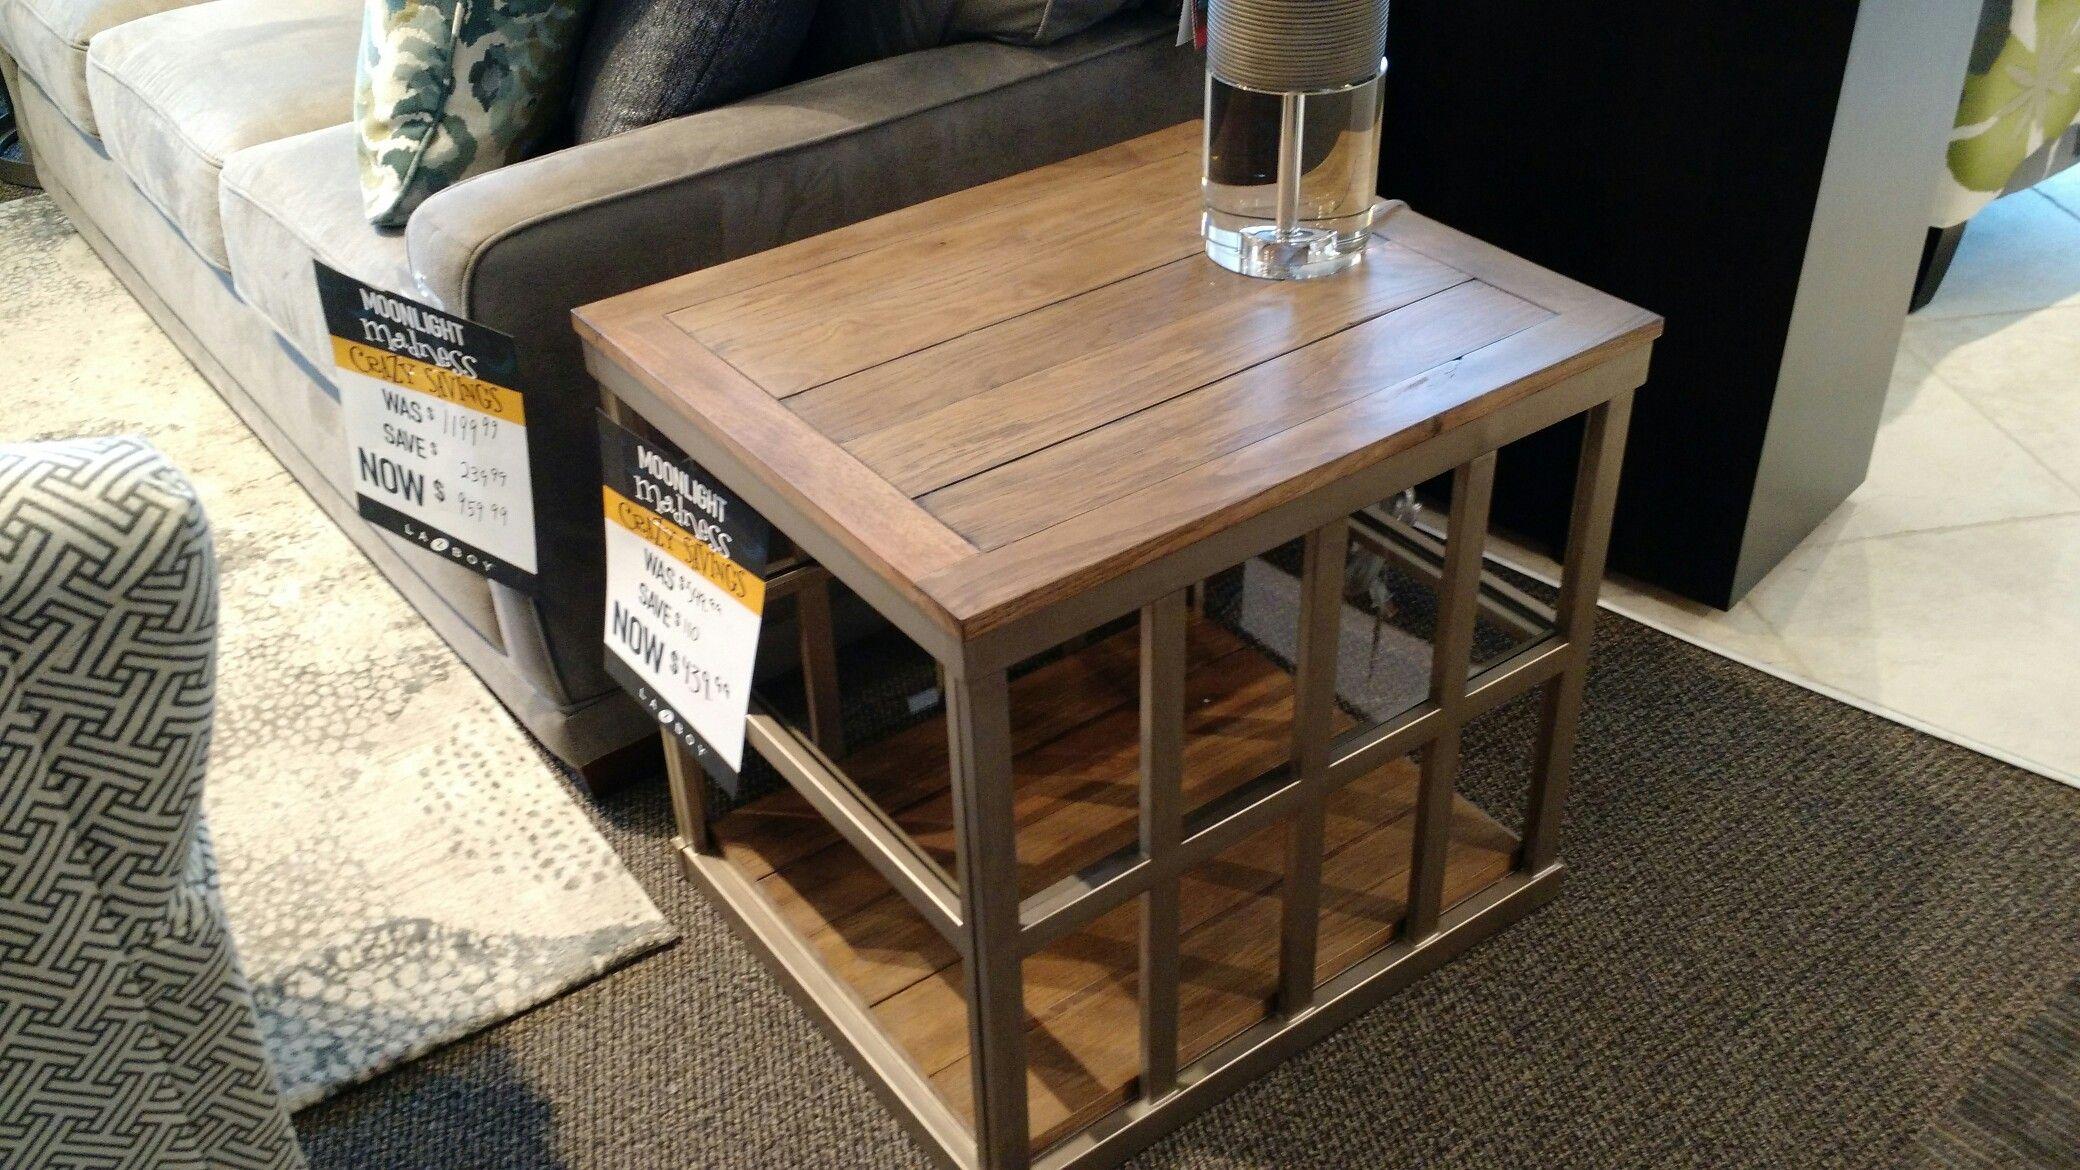 Lazy Boy End Table Home Decor Coffee Table Decor [ 1170 x 2080 Pixel ]